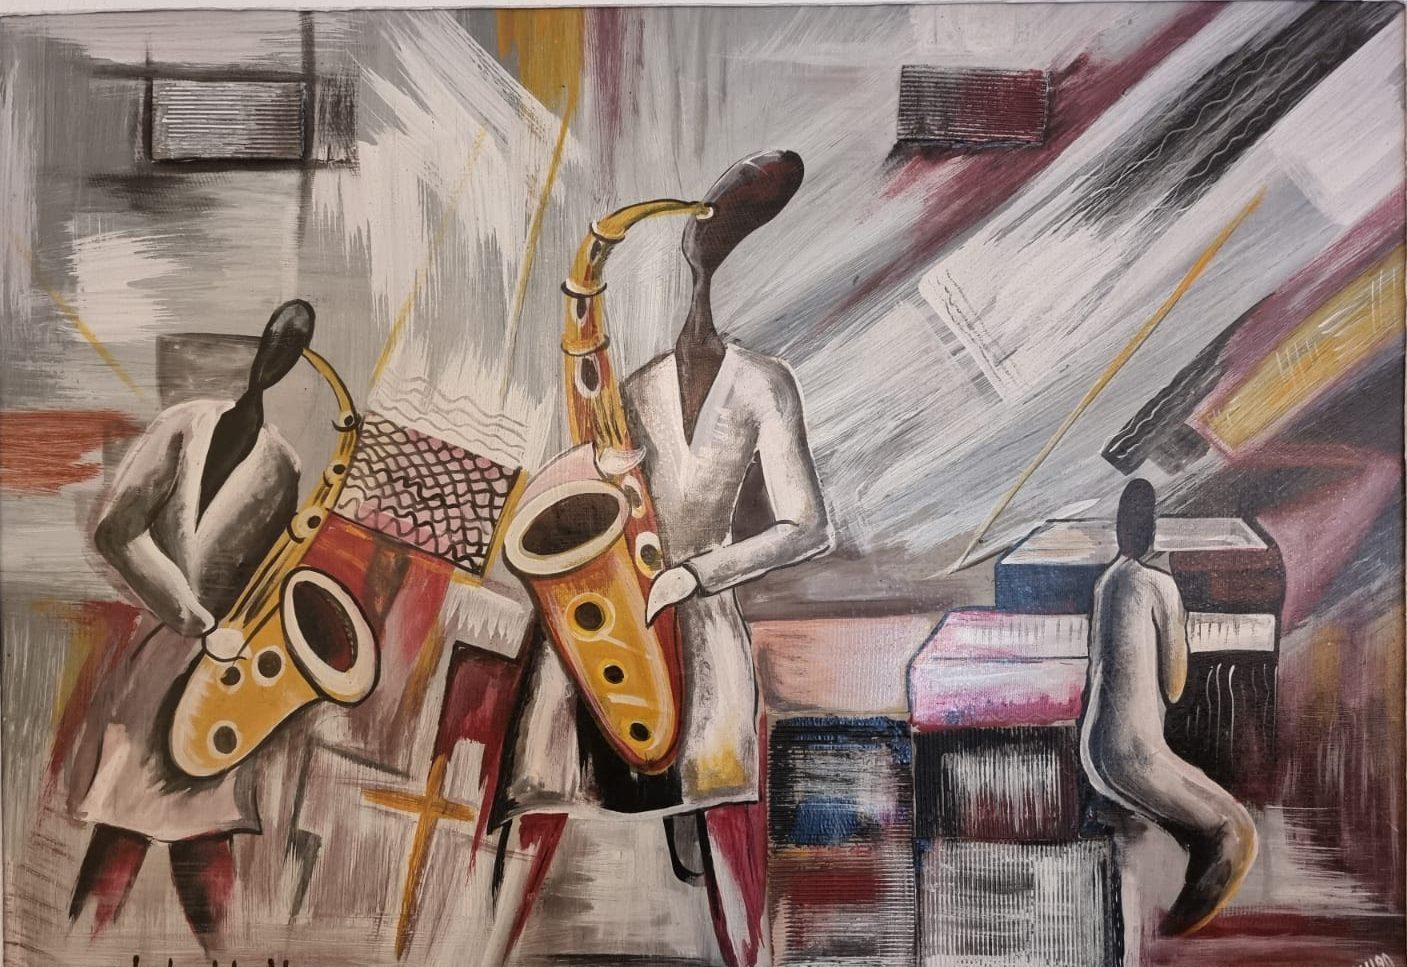 Khady Kounta's First Ever London Exhibition